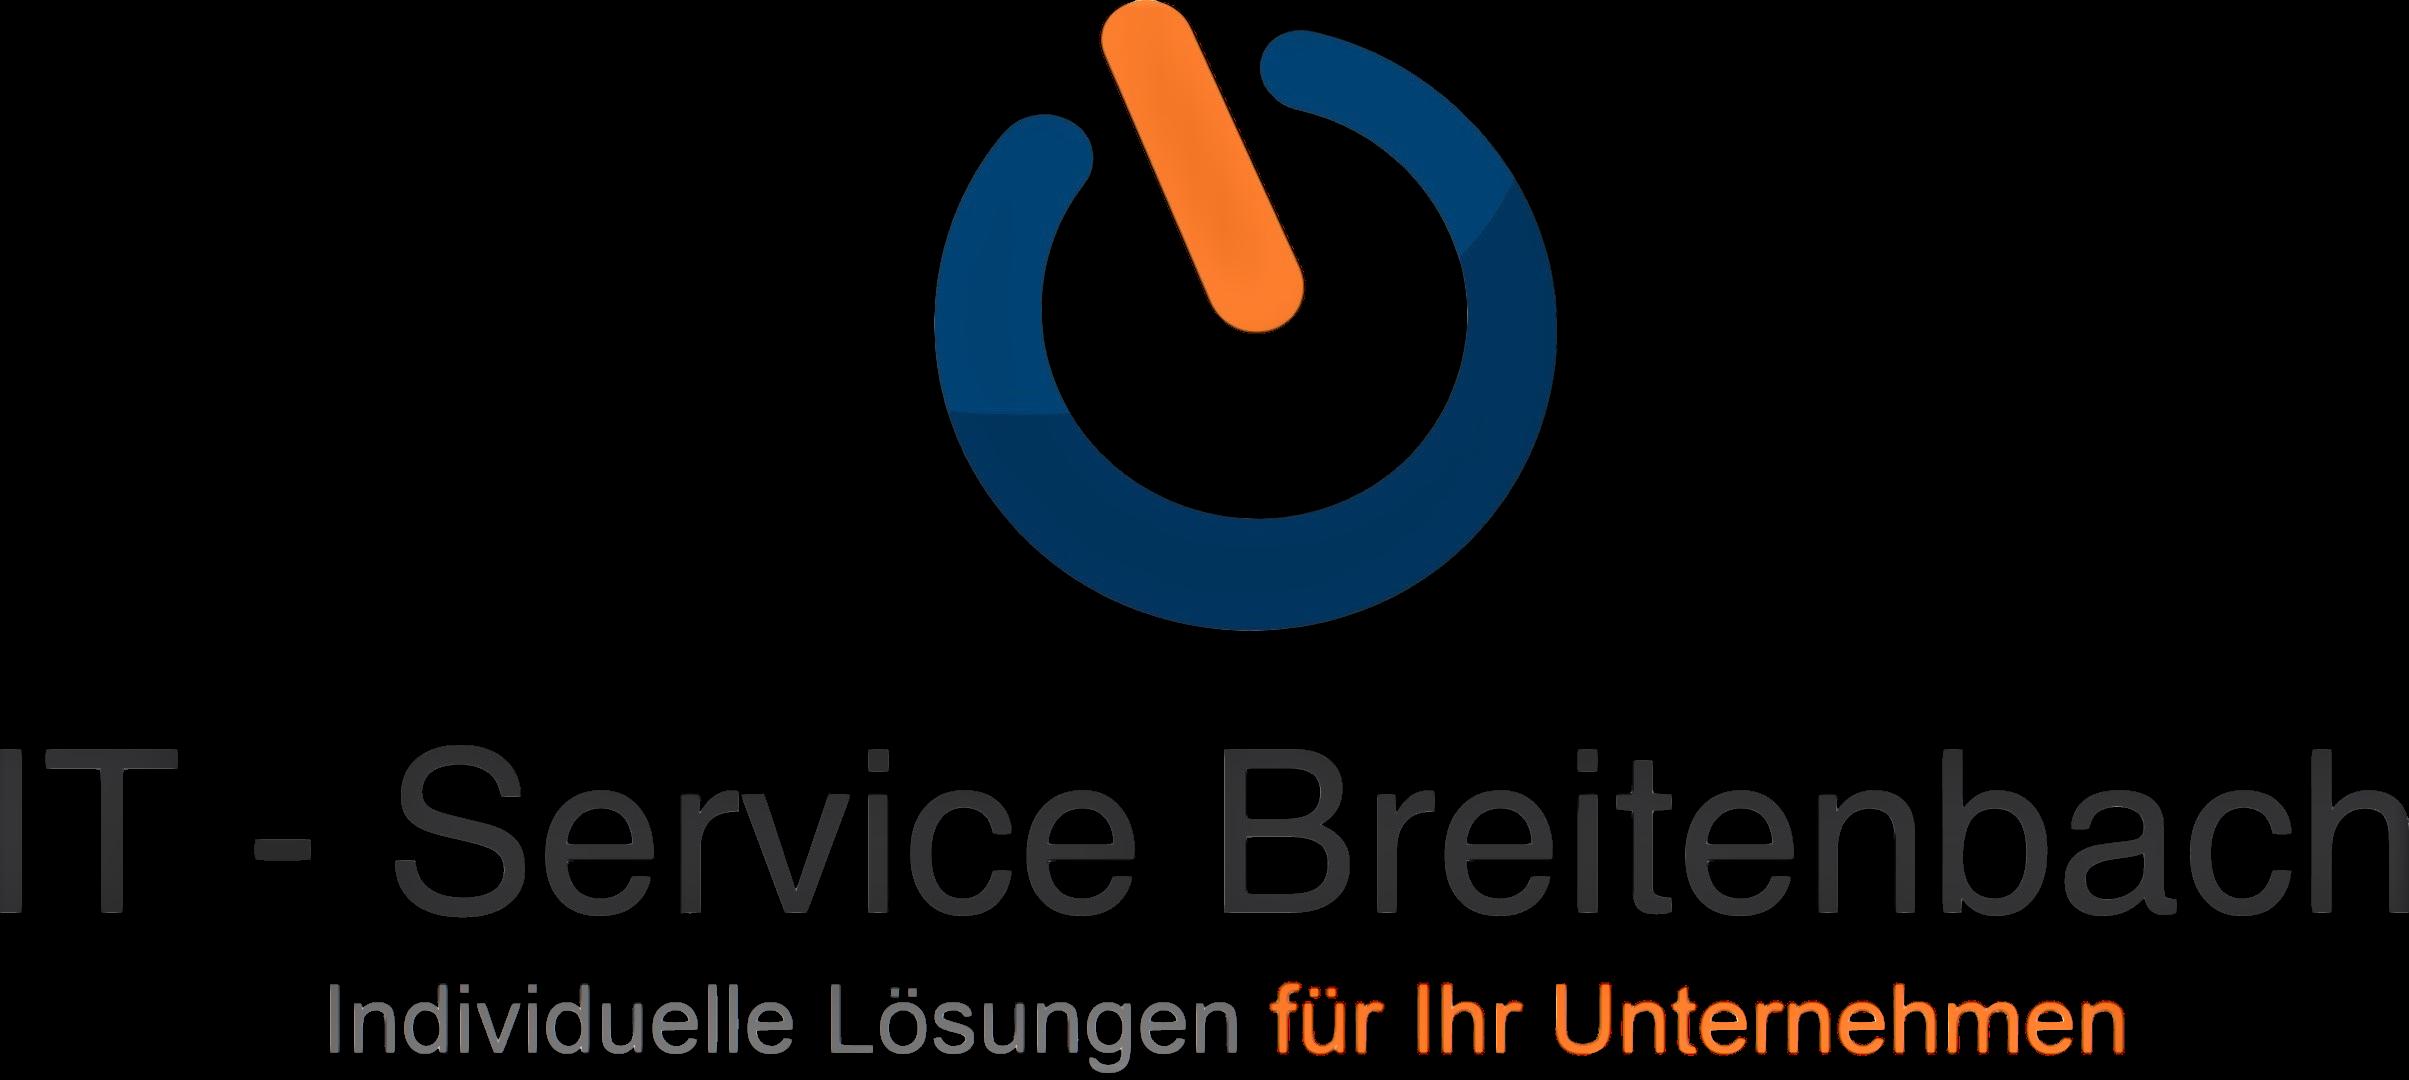 IT Service Berlin | IT Beratung | IT Betreuung | IT Service Breitenbach